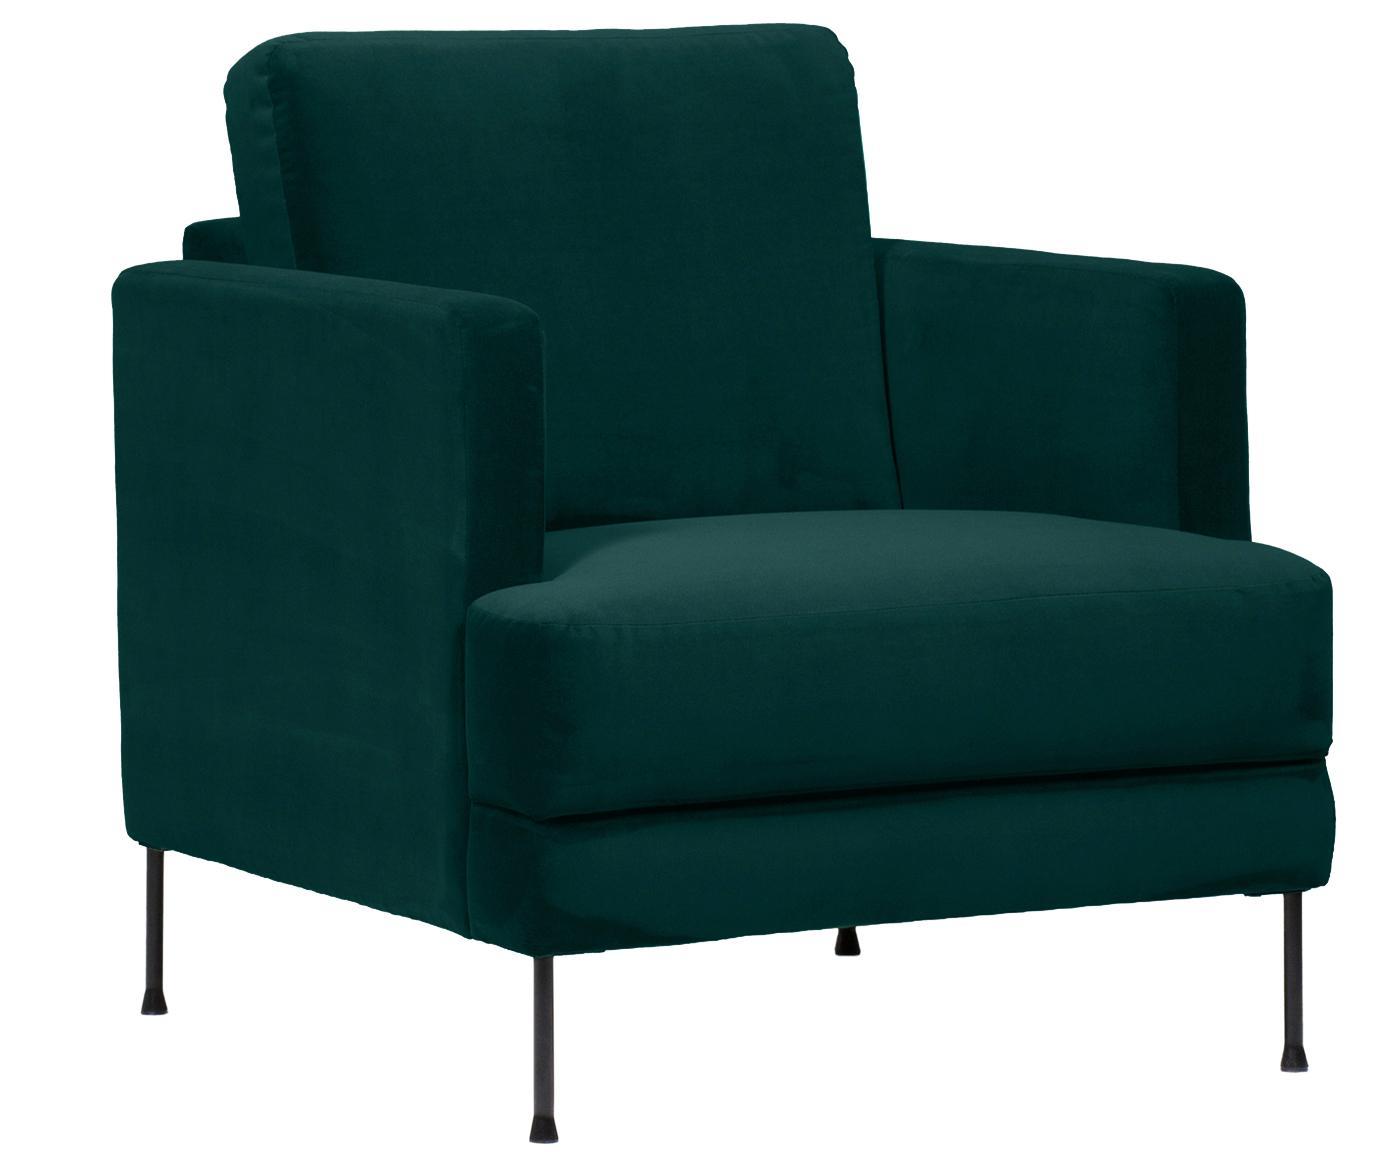 Samt-Sessel Fluente, Bezug: Samt (Polyester) 100.000 , Gestell: Massives Kiefernholz, Samt Dunkelgrün, B 76 x T 83 cm